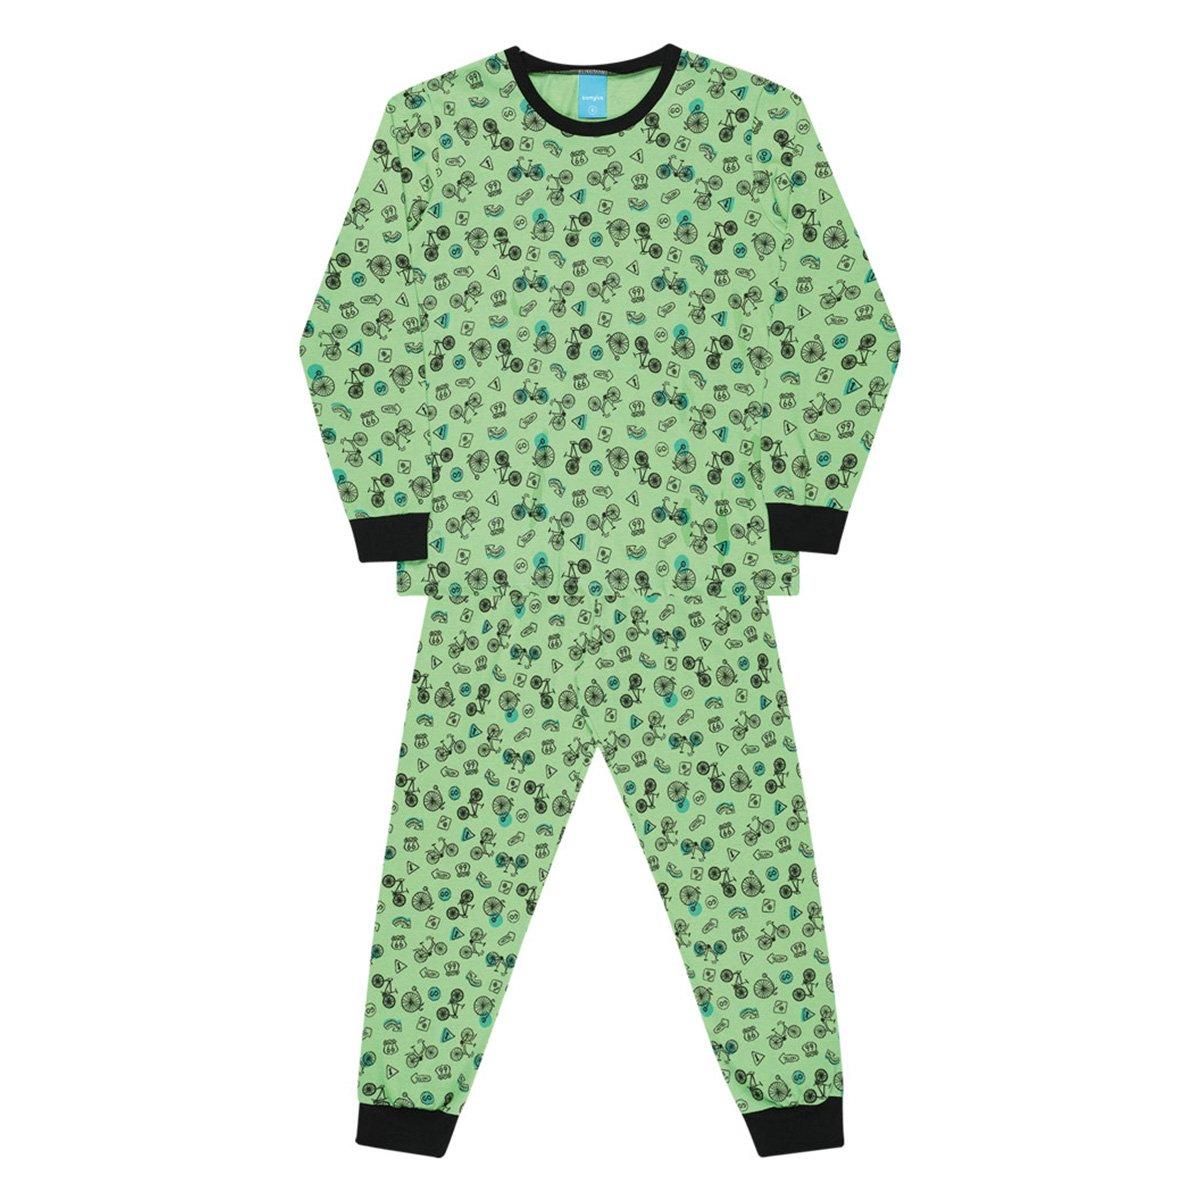 Pijama Infantil Kamylus Estampado Longo